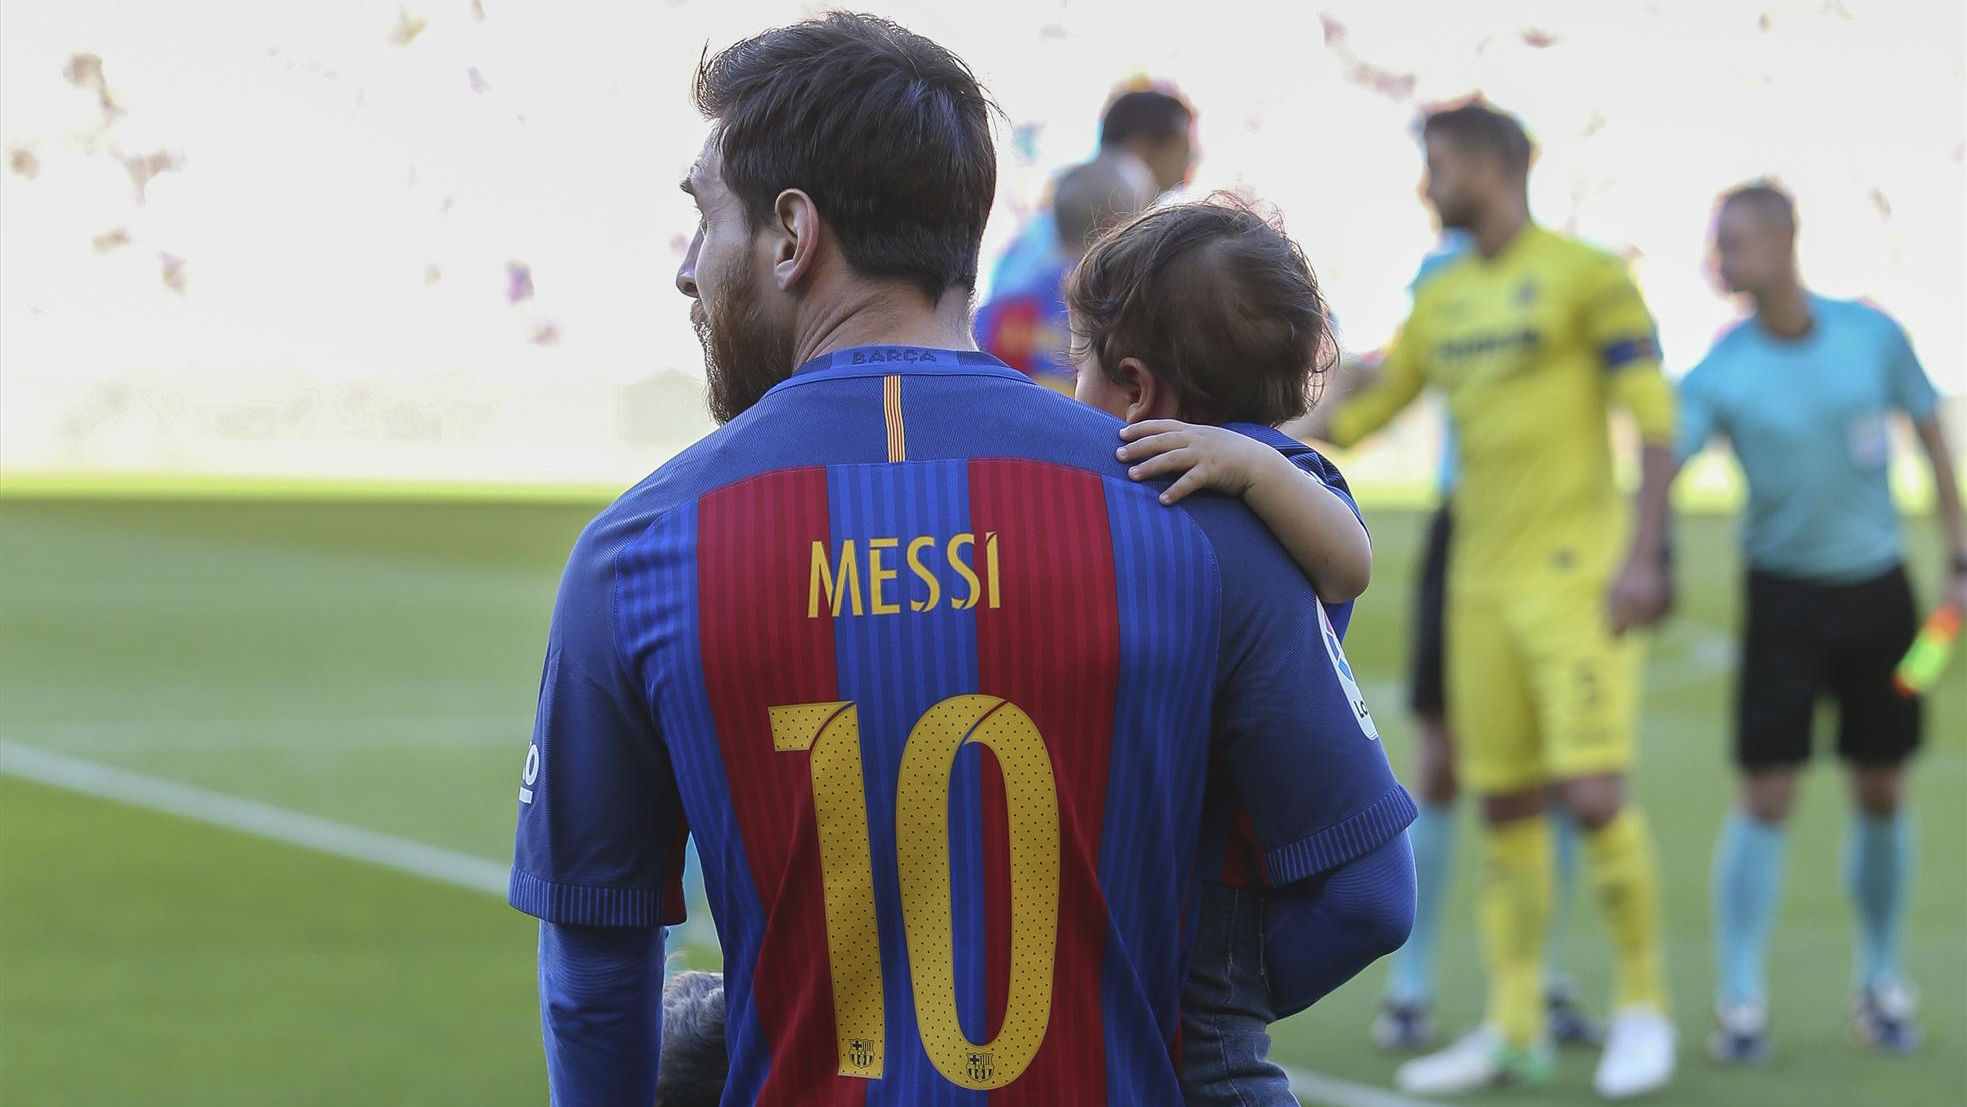 Messi mostró a su hijo Mateo cantando